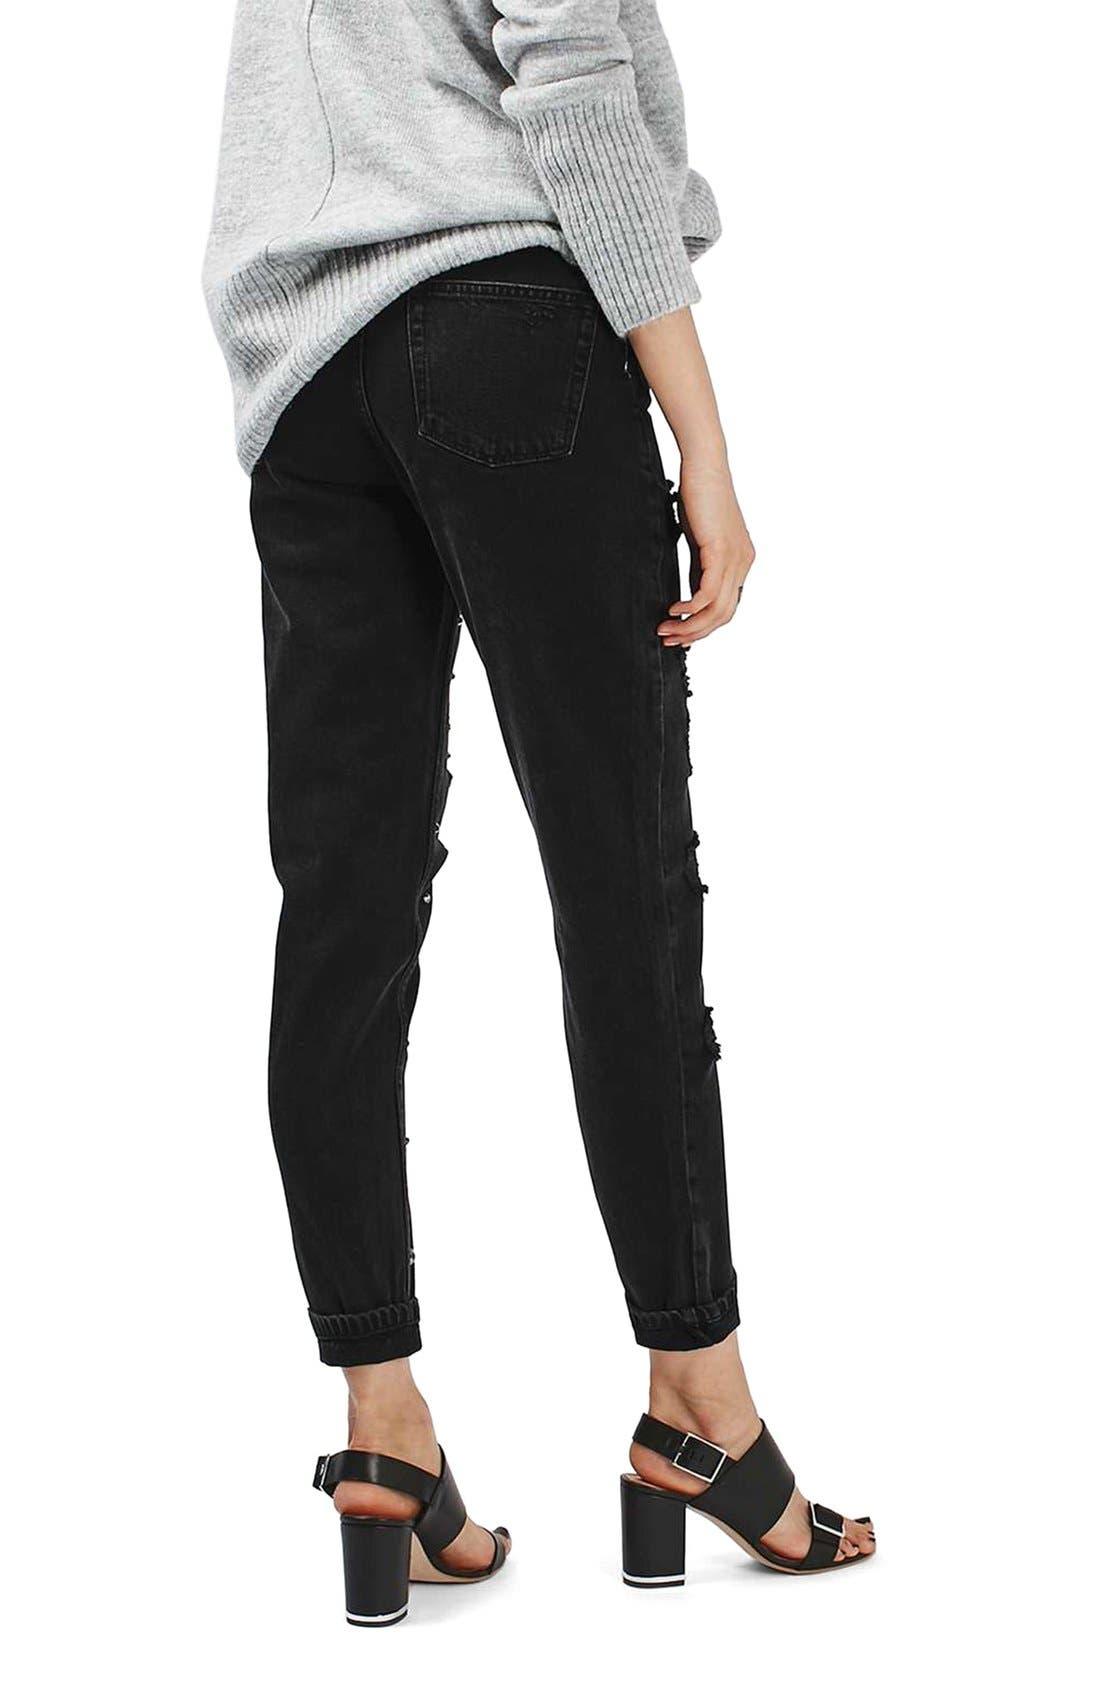 Alternate Image 3  - Topshop Moto Mom Studded Super Ripped Jeans